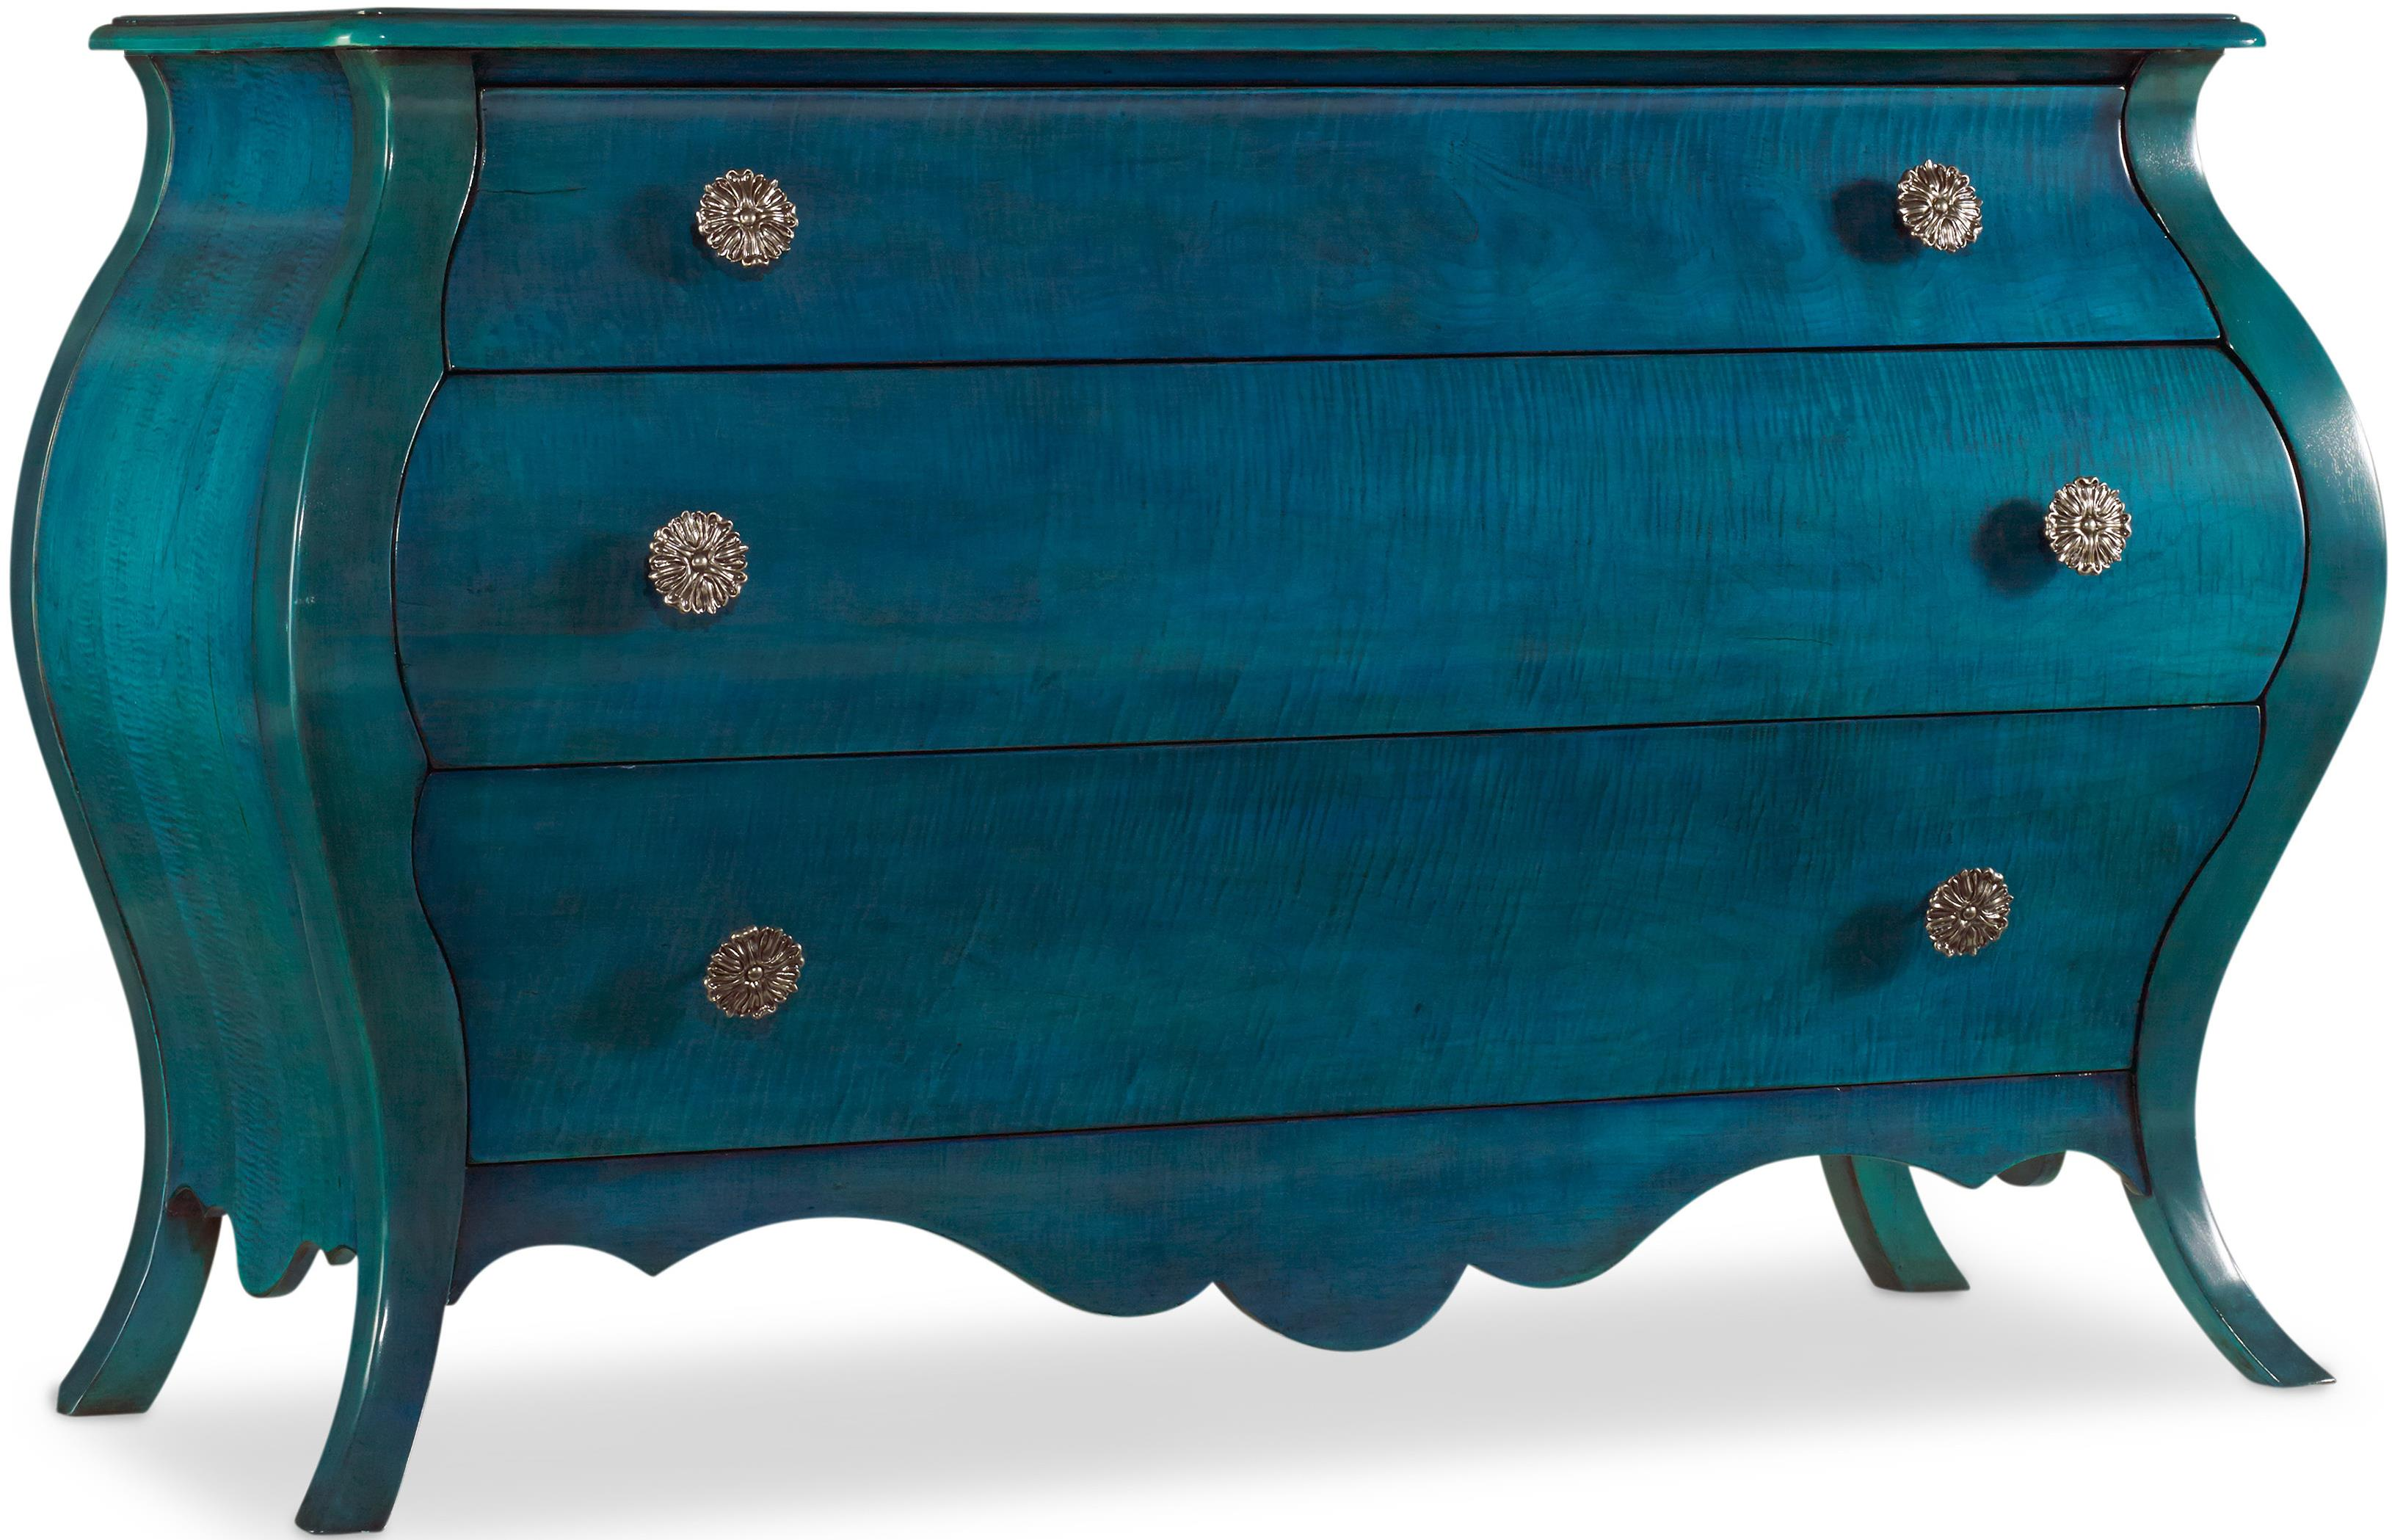 Hooker Furniture Mélange Turquoise Nina Bombe Chest - Item Number: 638-85171